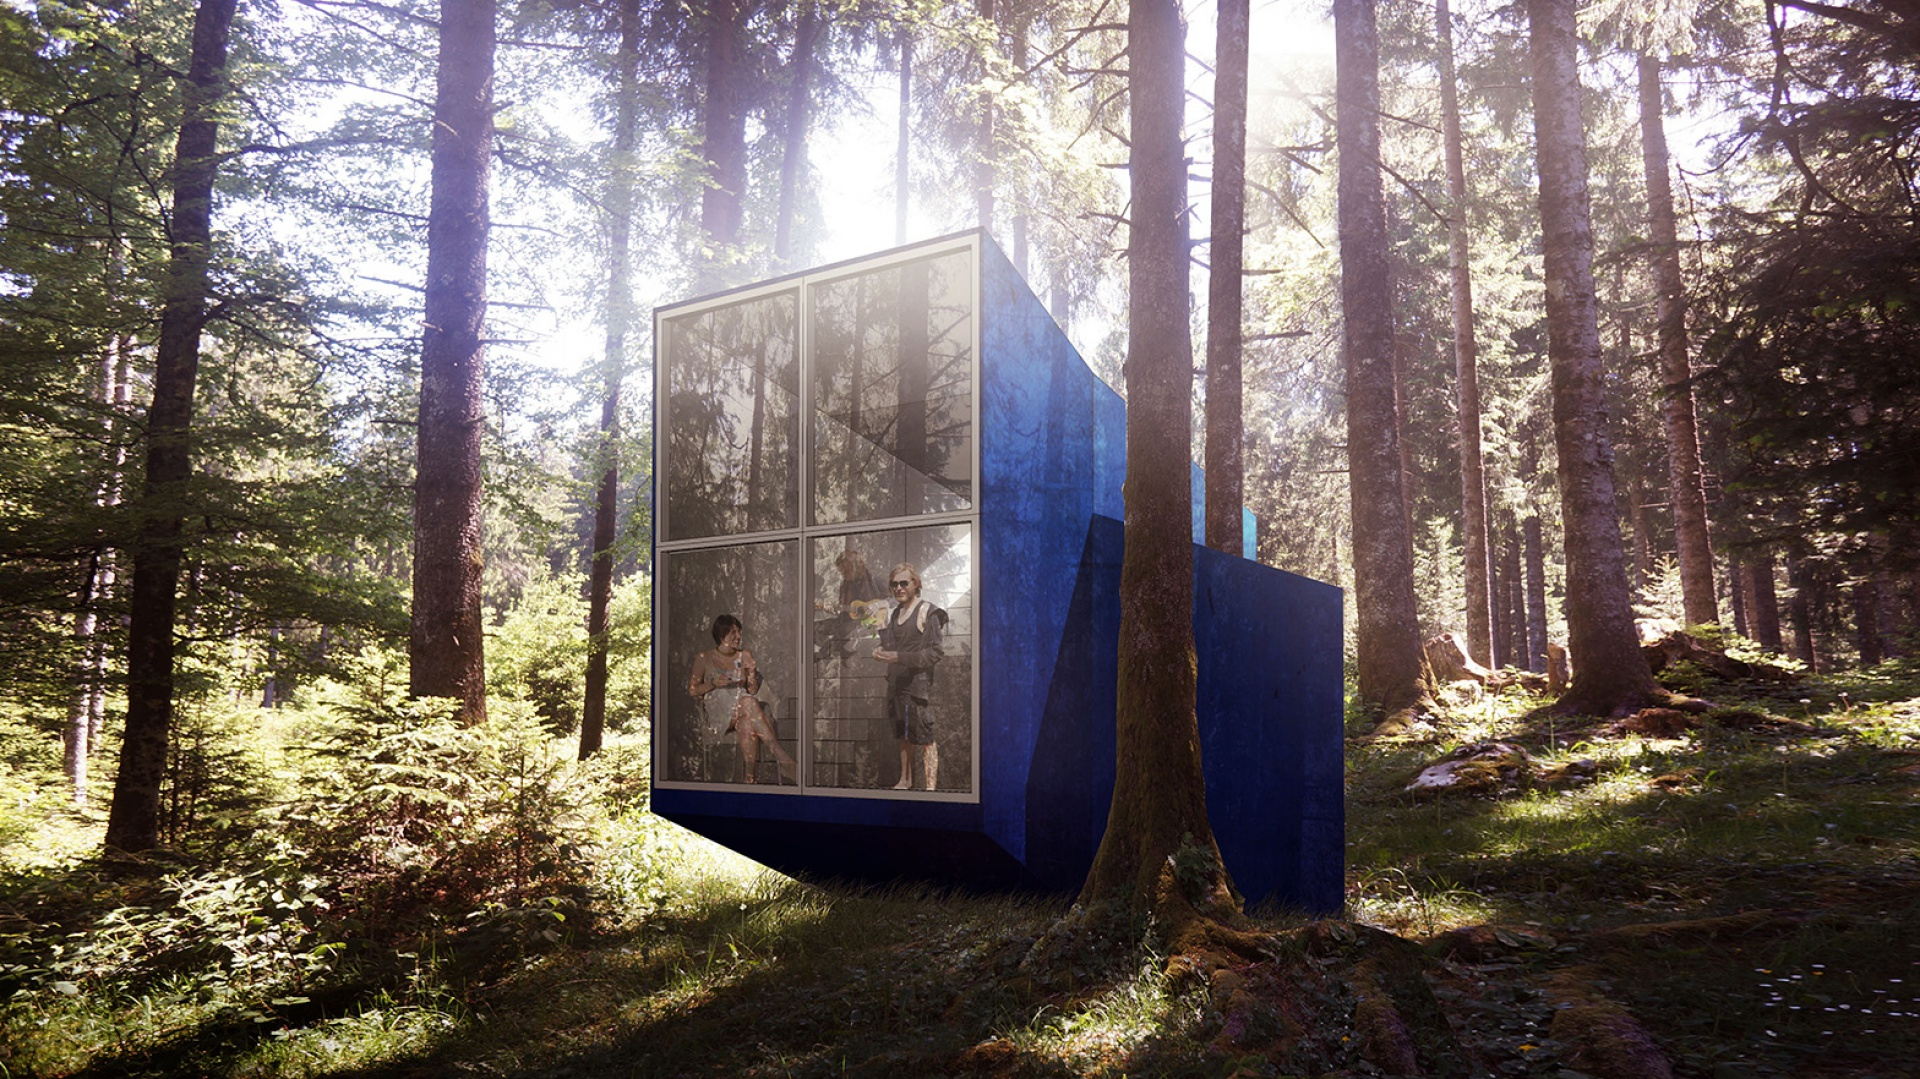 Beetle House to wspólny projekt pracowni: Anonymous, BXBstudio, Architectural Farm oraz Loic Picquet.